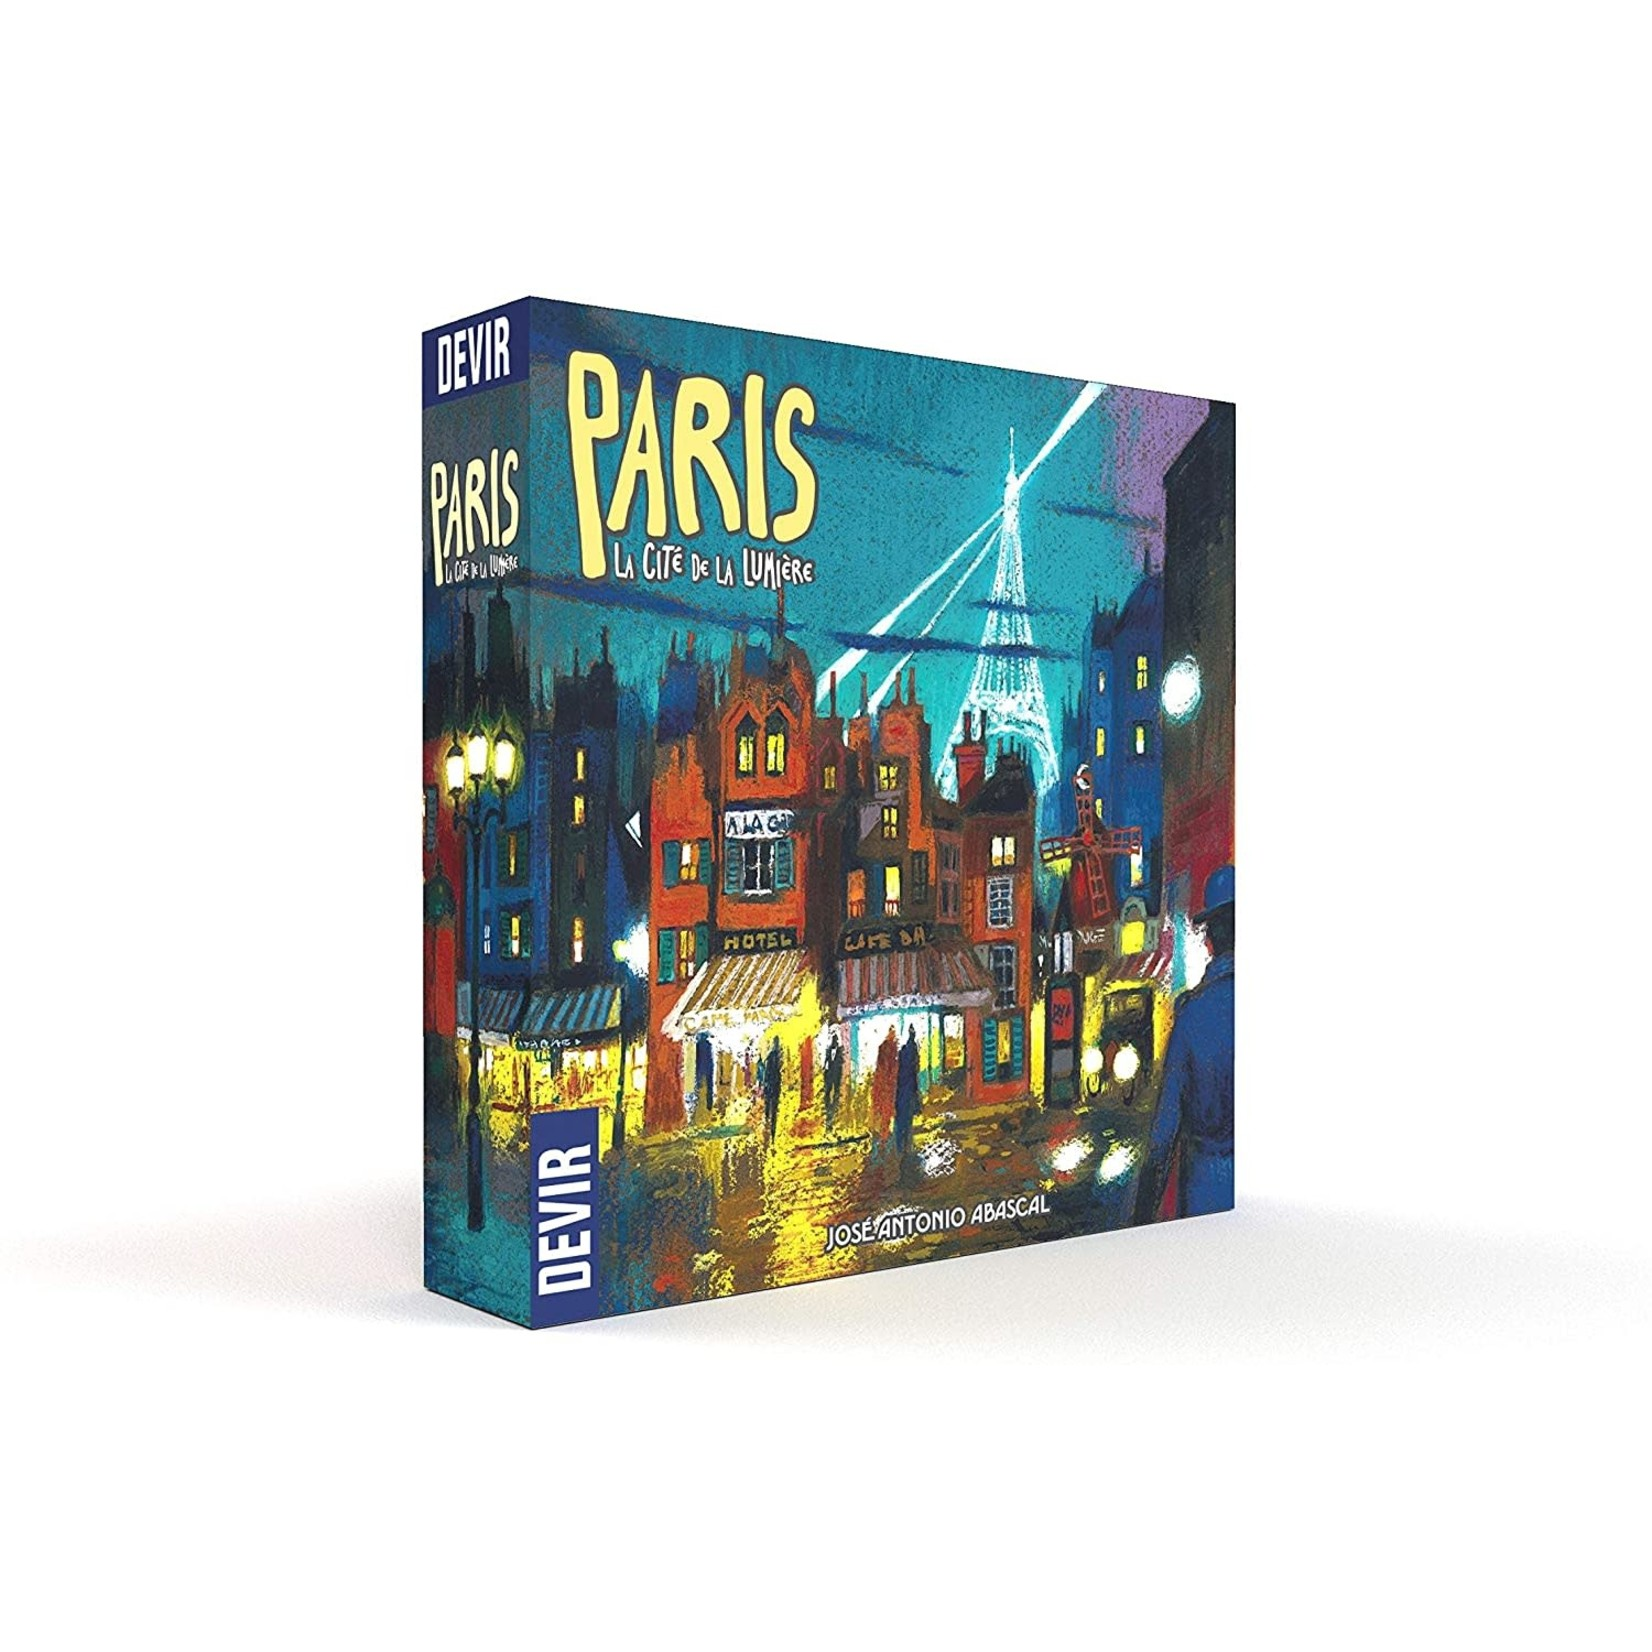 Devir Paris: La Cite de la Luminere